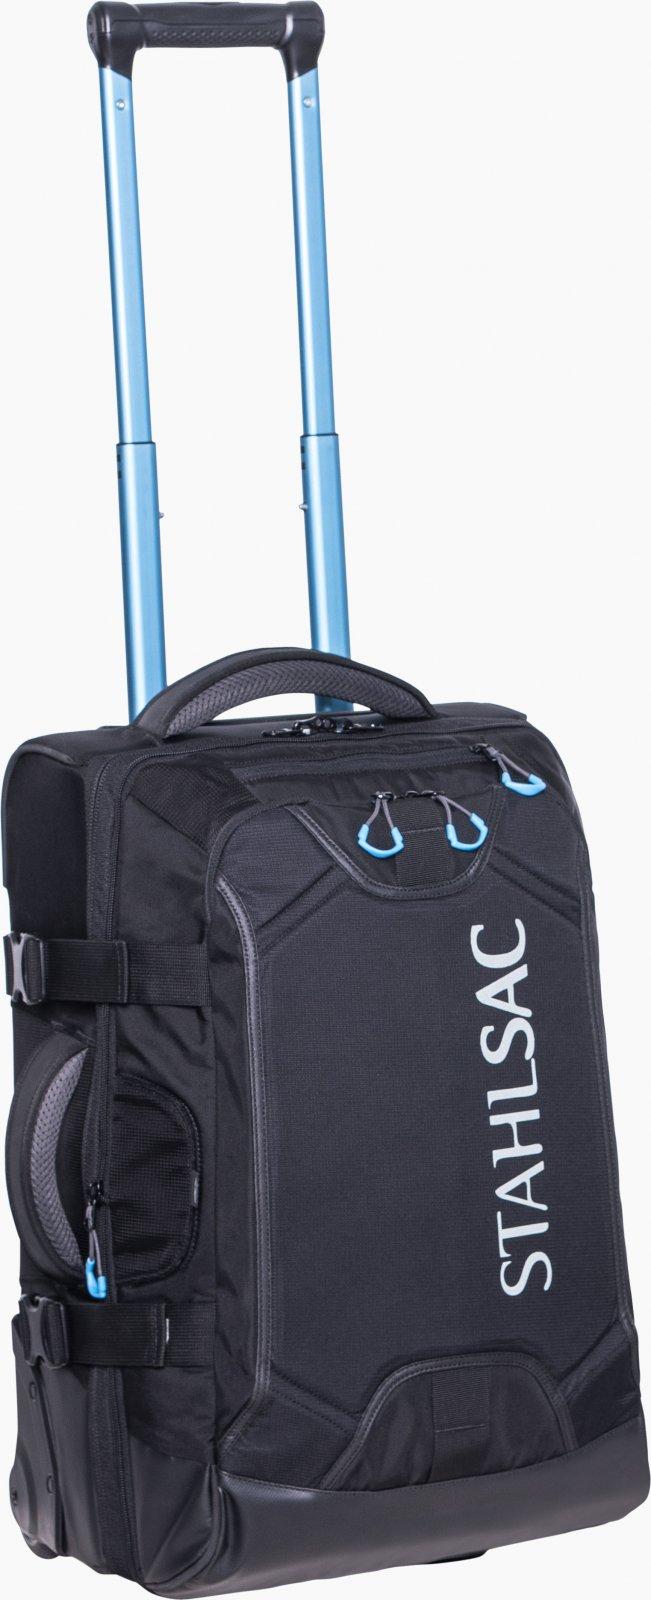 STAHLSAC Steel Wheeled Bag - 22